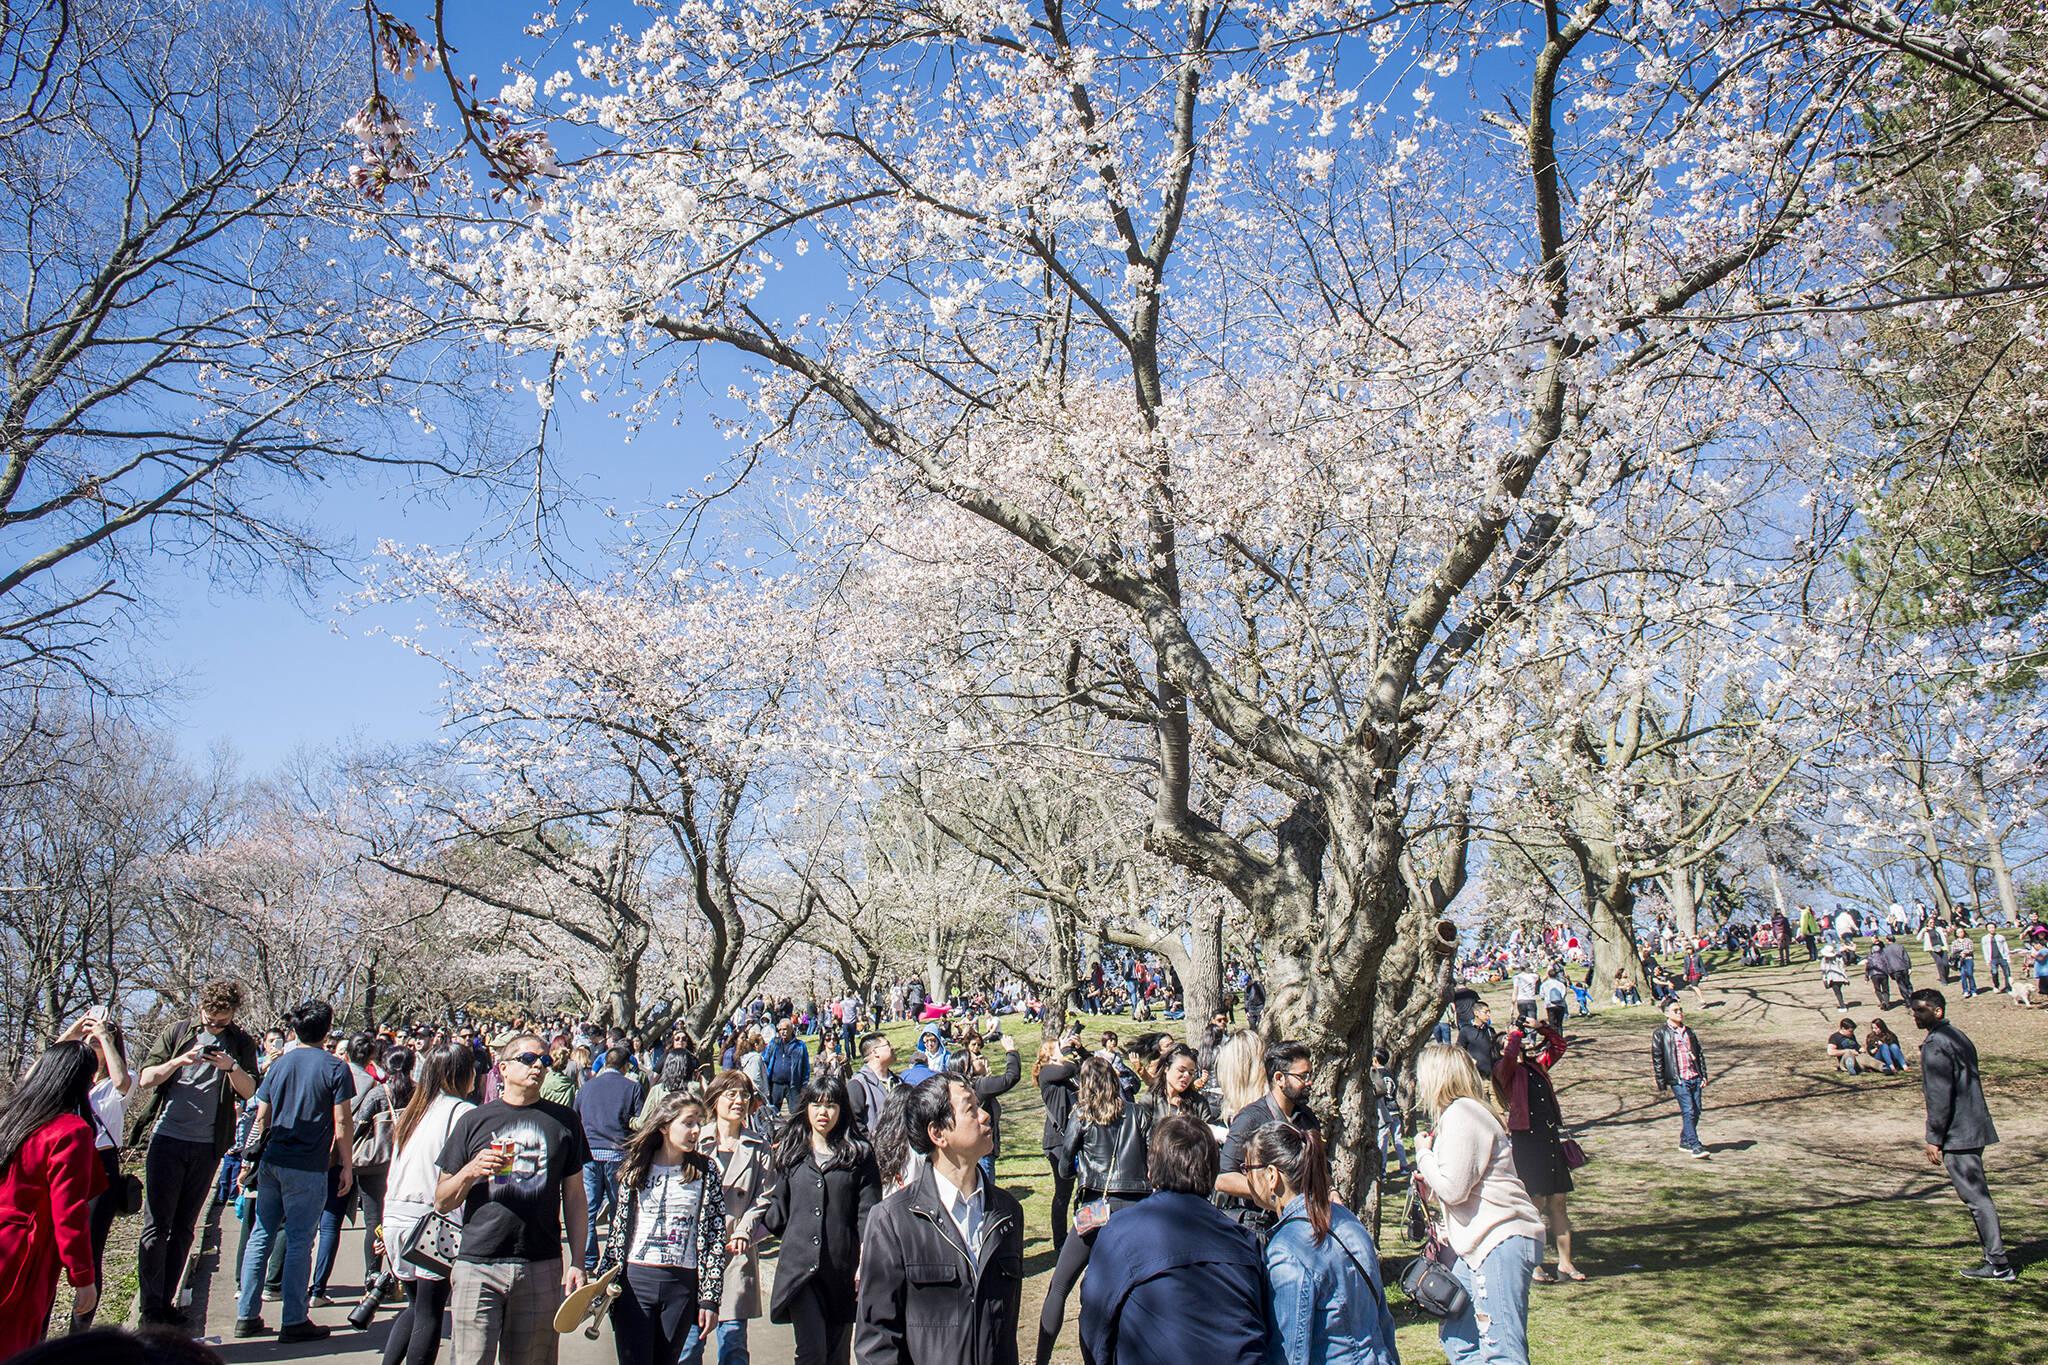 high park cherry blossoms 2018